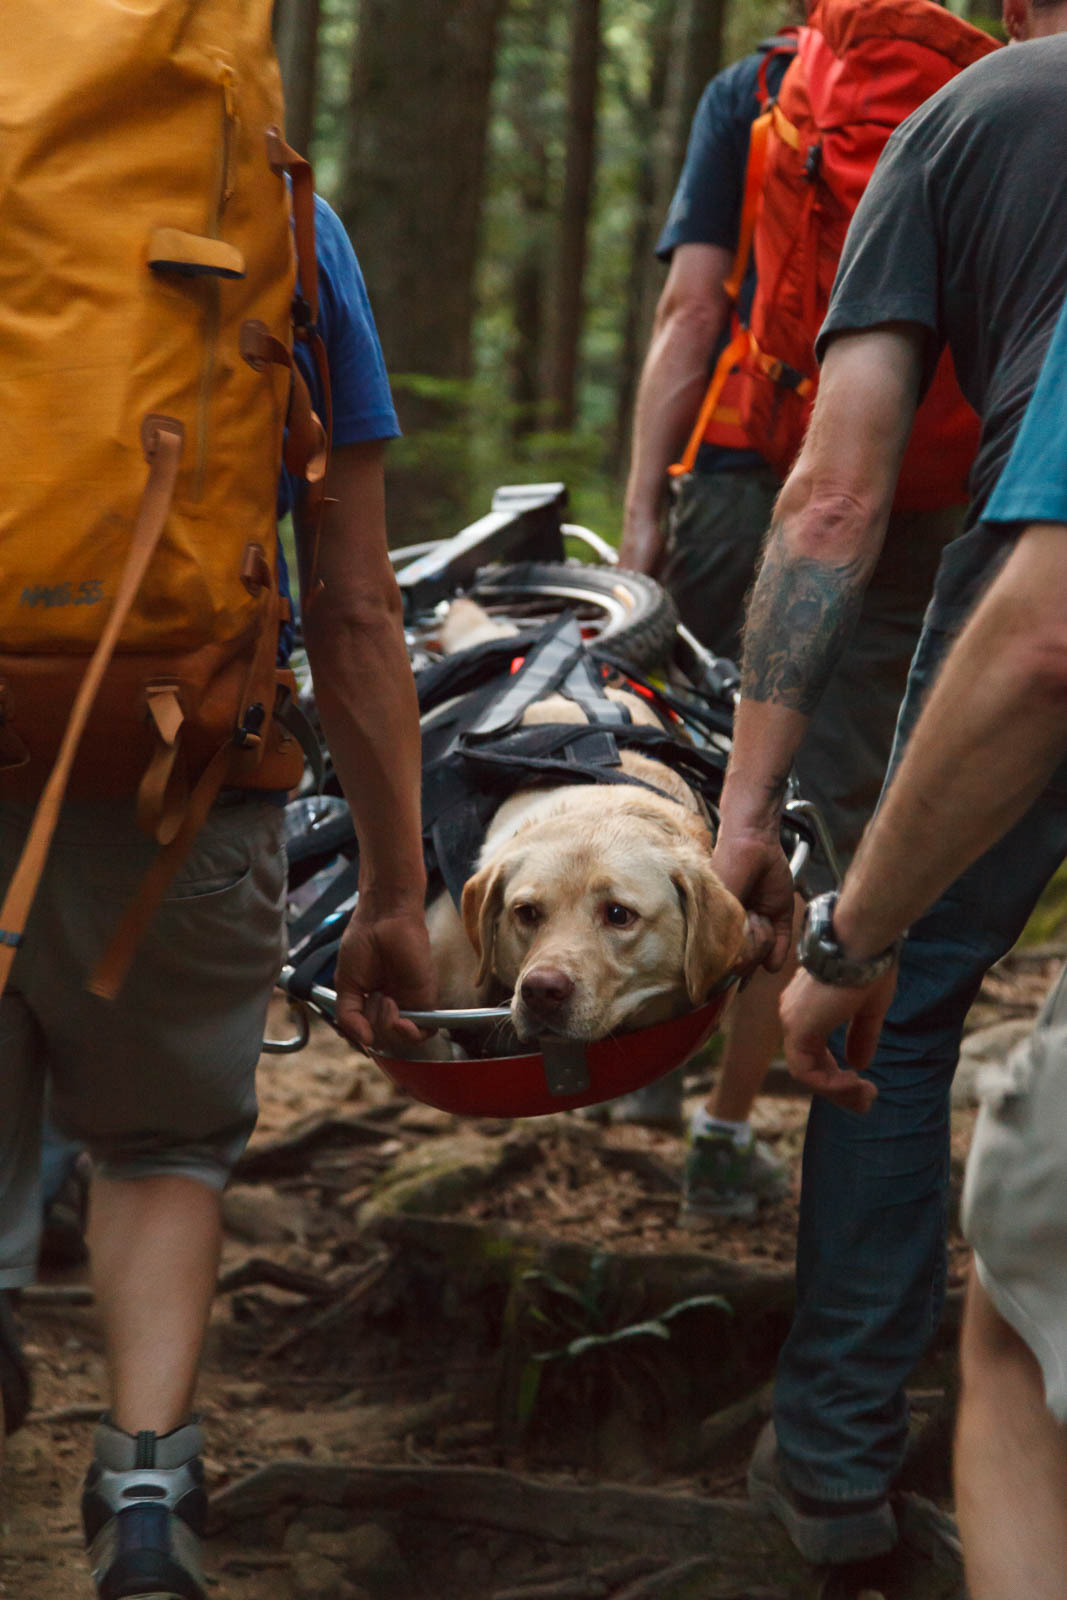 Image: North Shore Rescue / Facebook